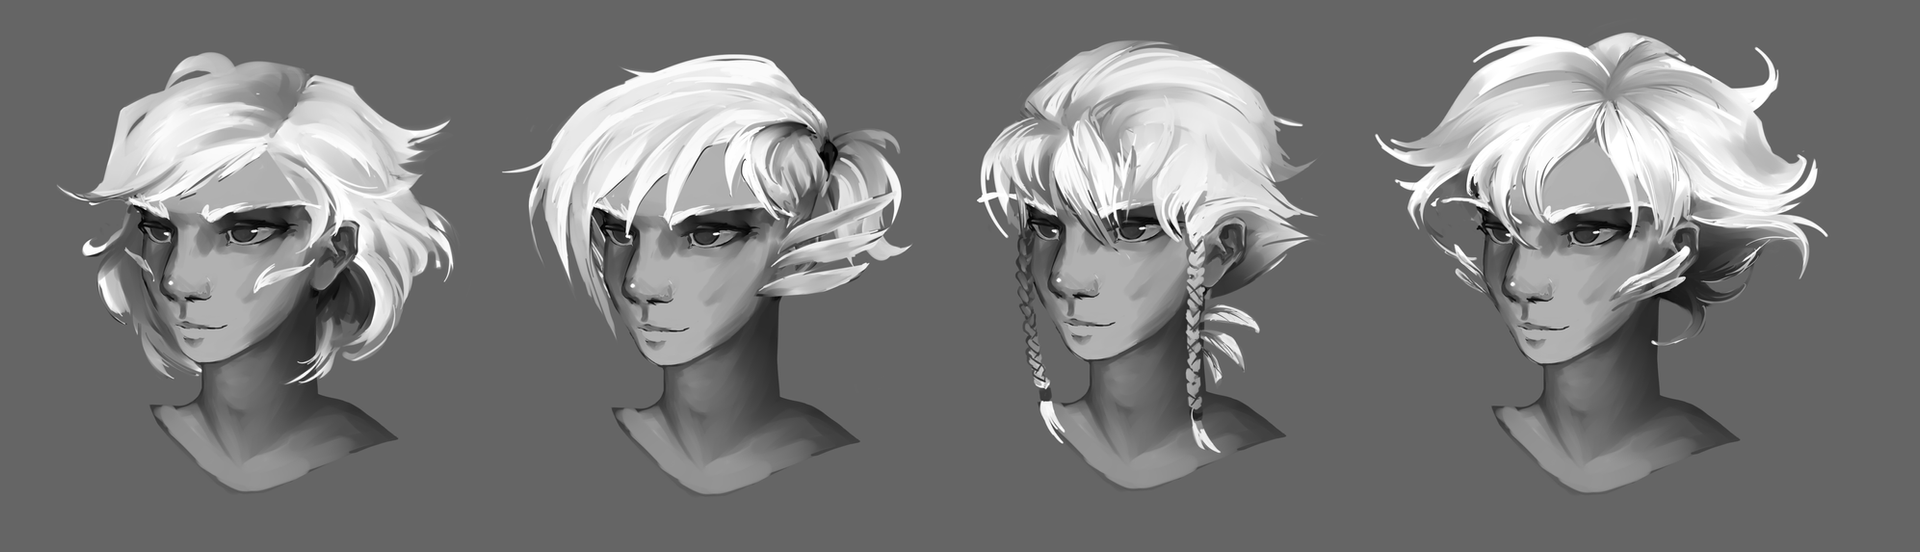 Zorra: Heads